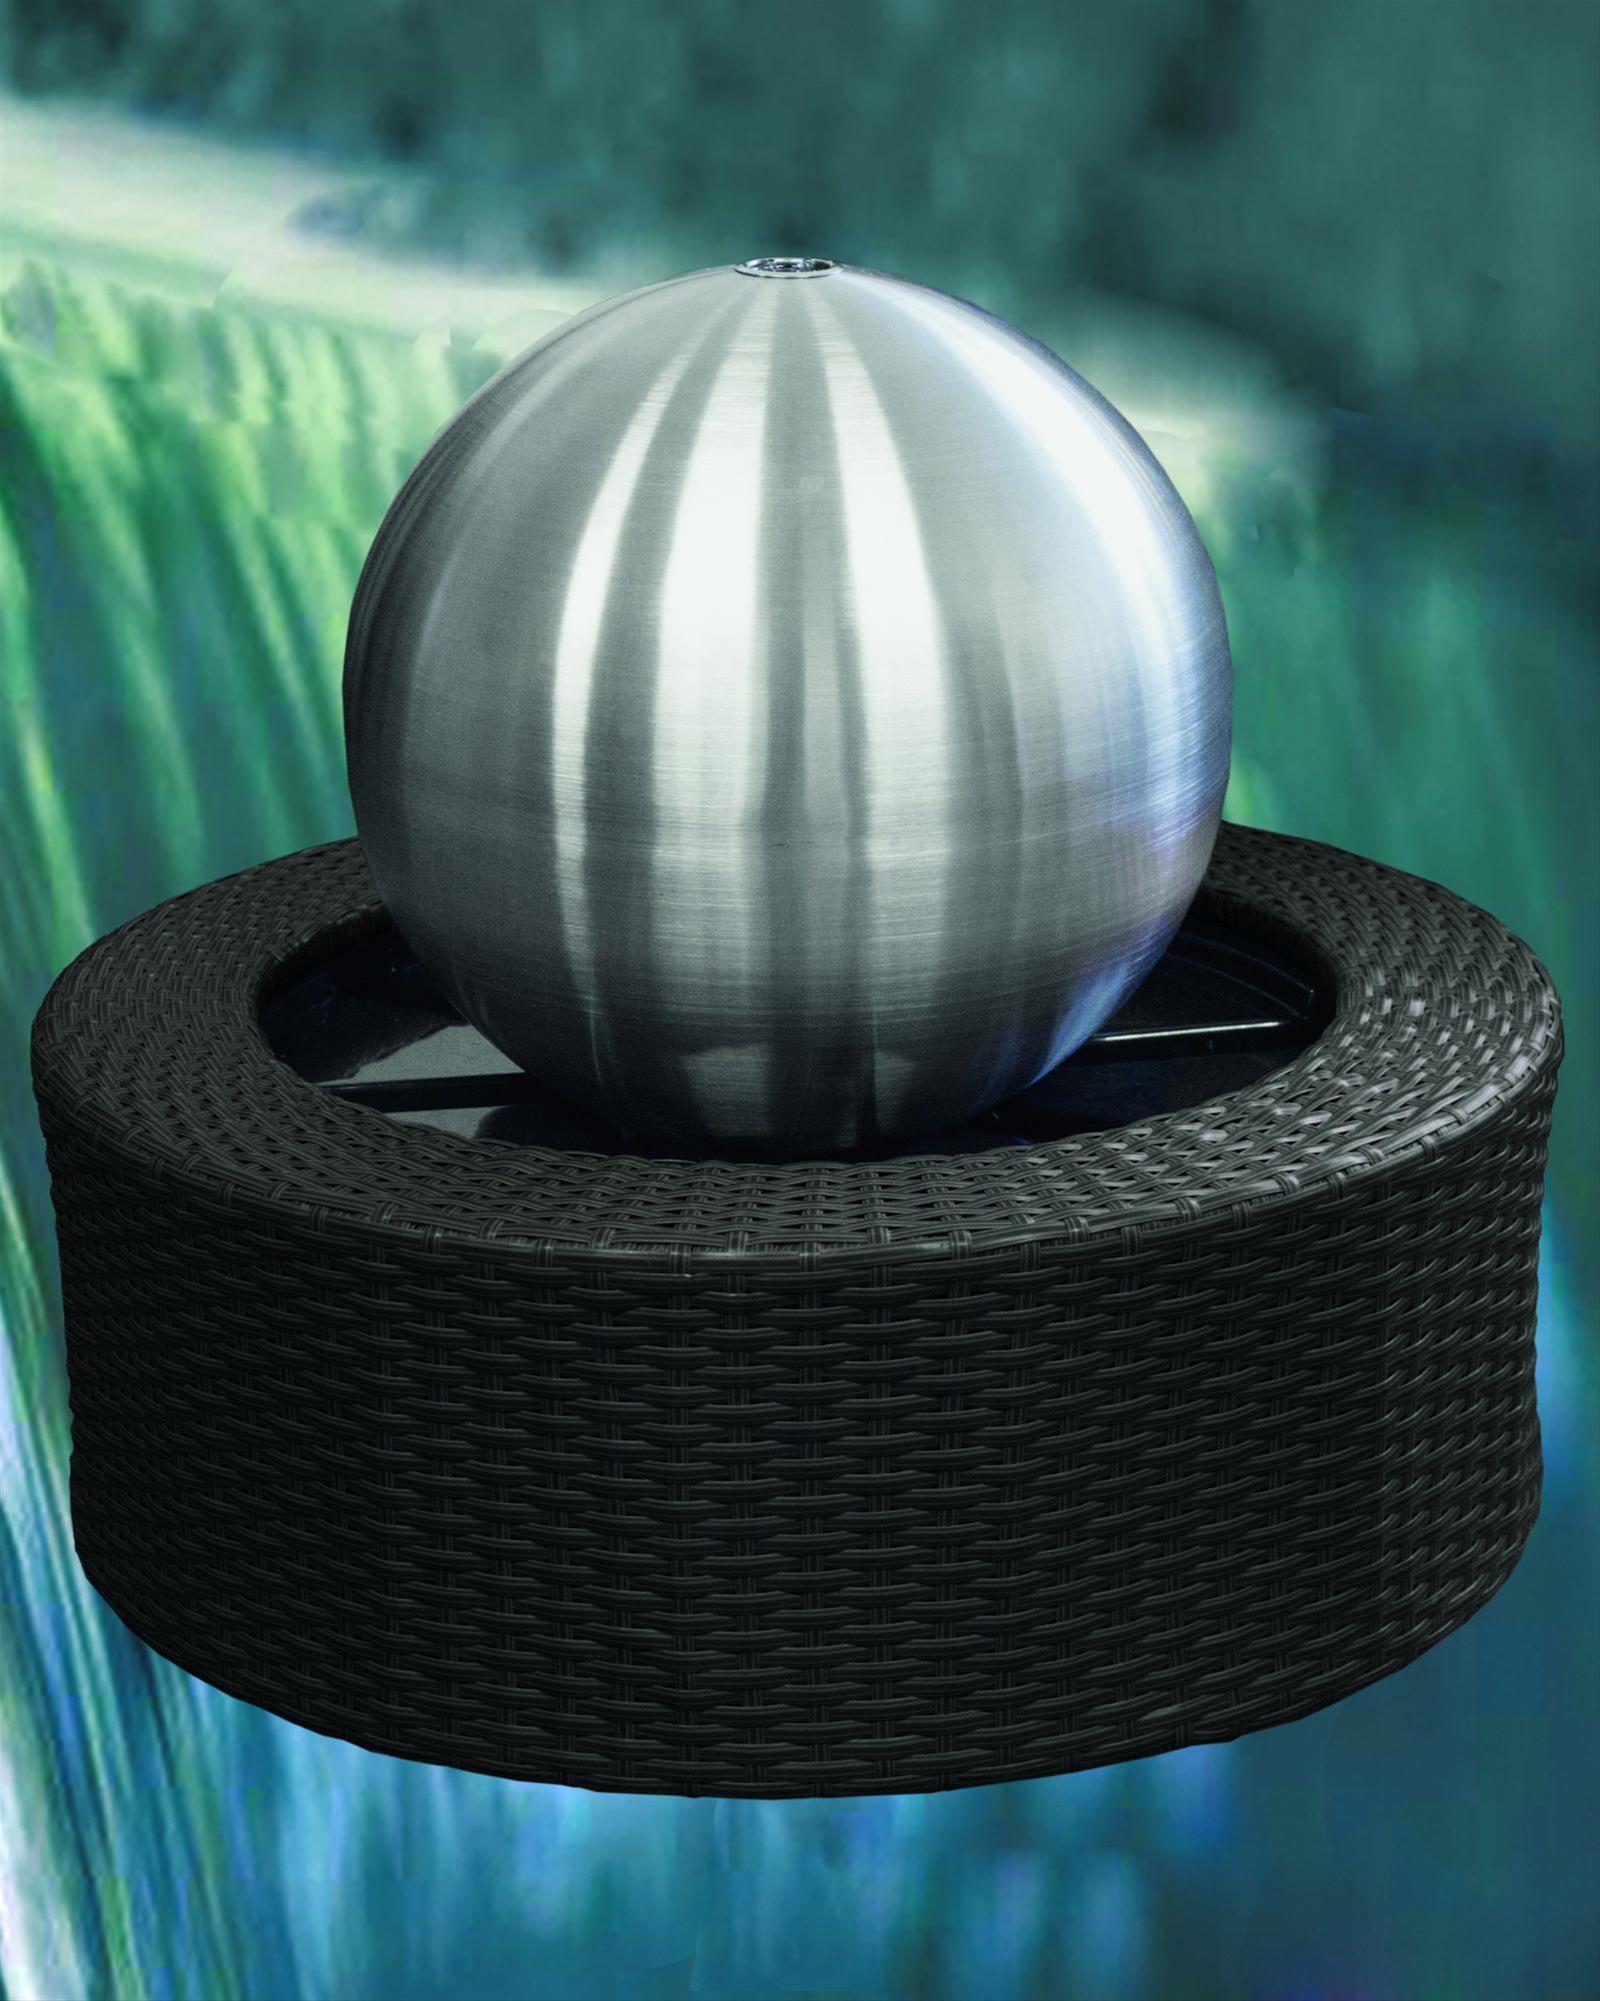 Wasserspiel / Gartenbrunnen GardenForma Edelstahl-Kugel matt LED Ø35cm Bild 3